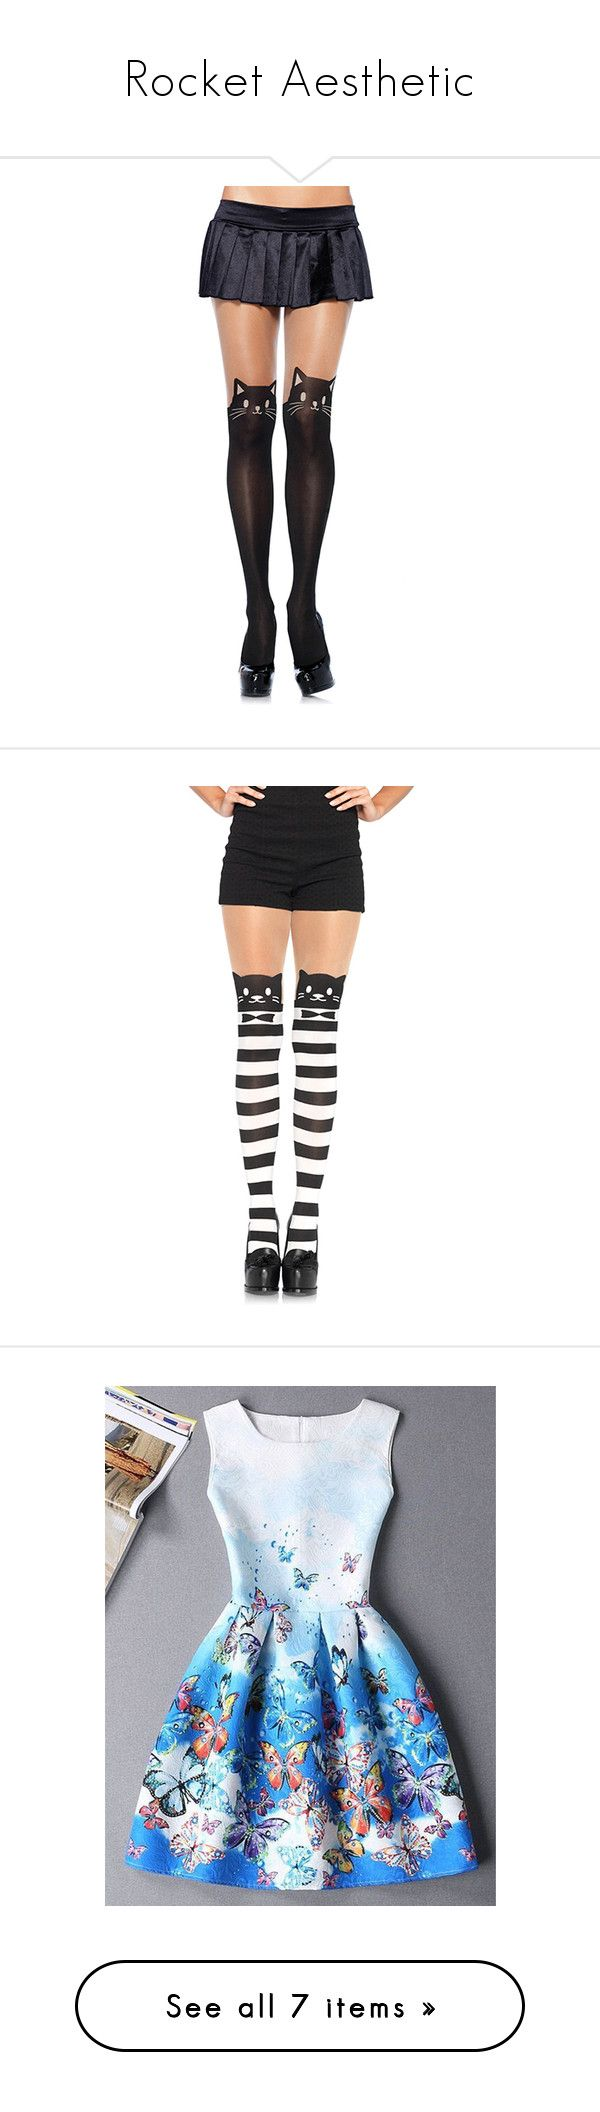 """Rocket Aesthetic"" by asriel20asi ❤ liked on Polyvore featuring intimates, hosiery, tights, black, socks & hosiery, leg avenue stockings, leg avenue pantyhose, animal print tights, leg avenue tights and leg avenue"